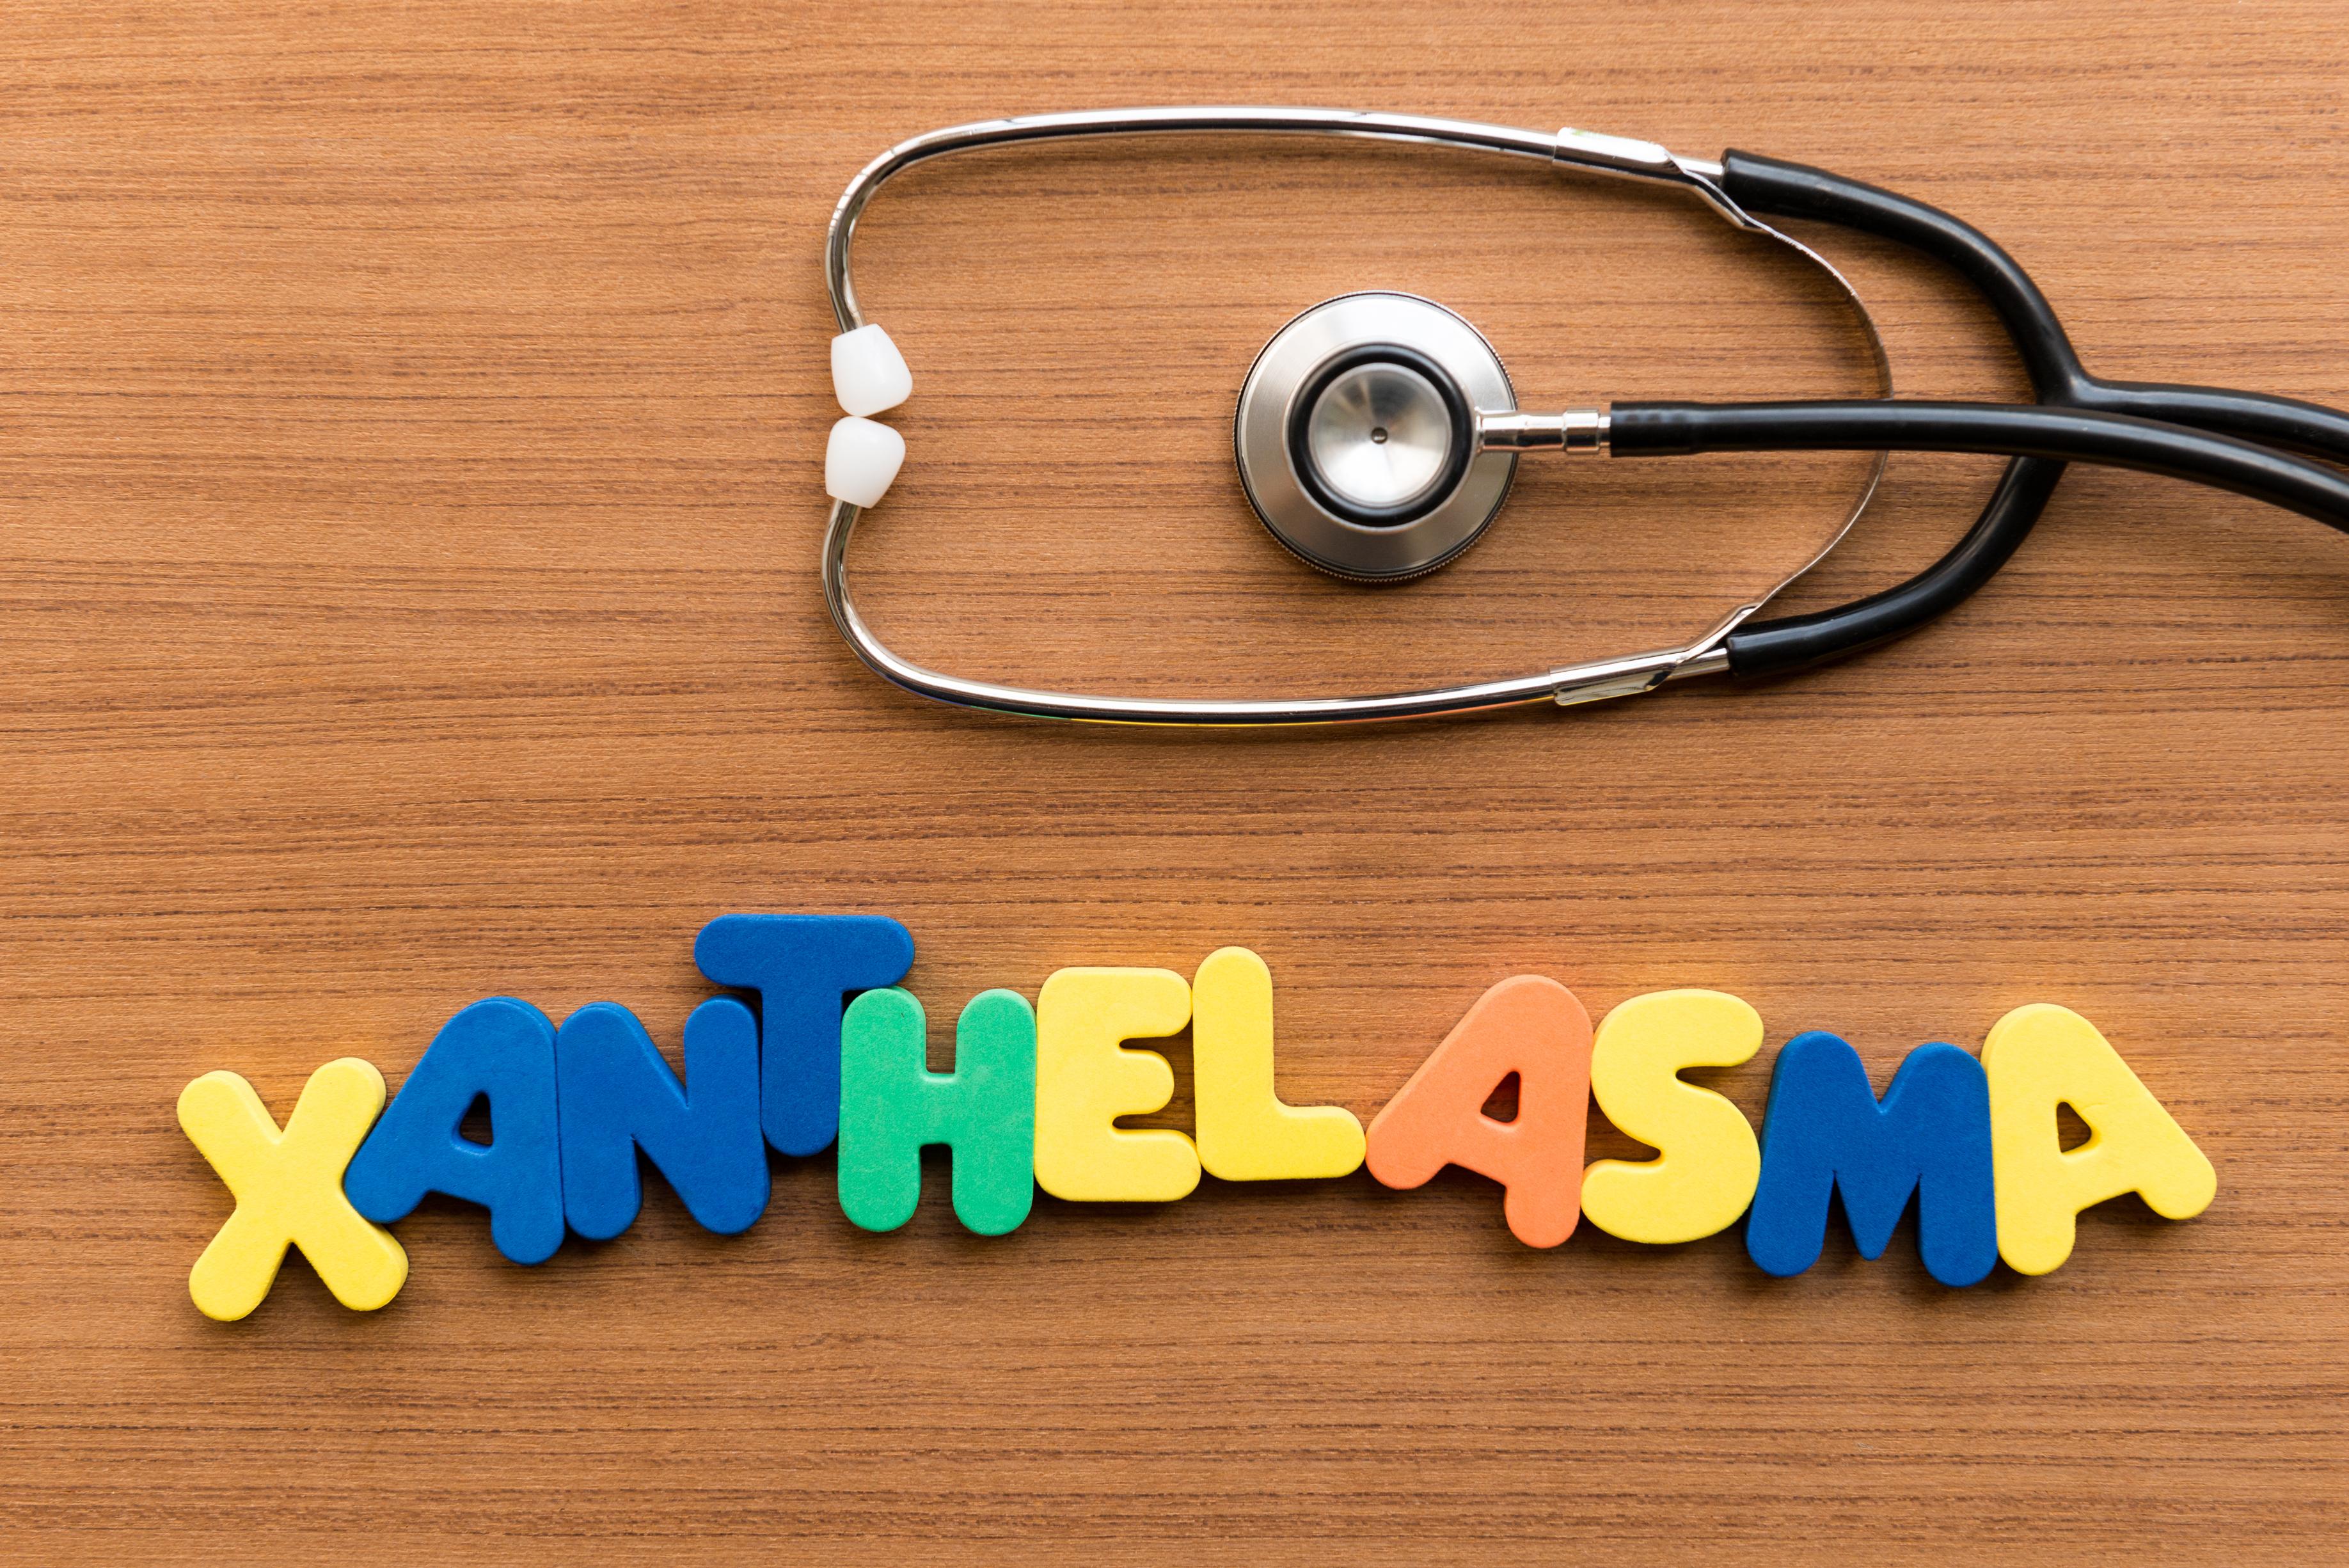 xanthelasma choelsterol deposits around the eyes